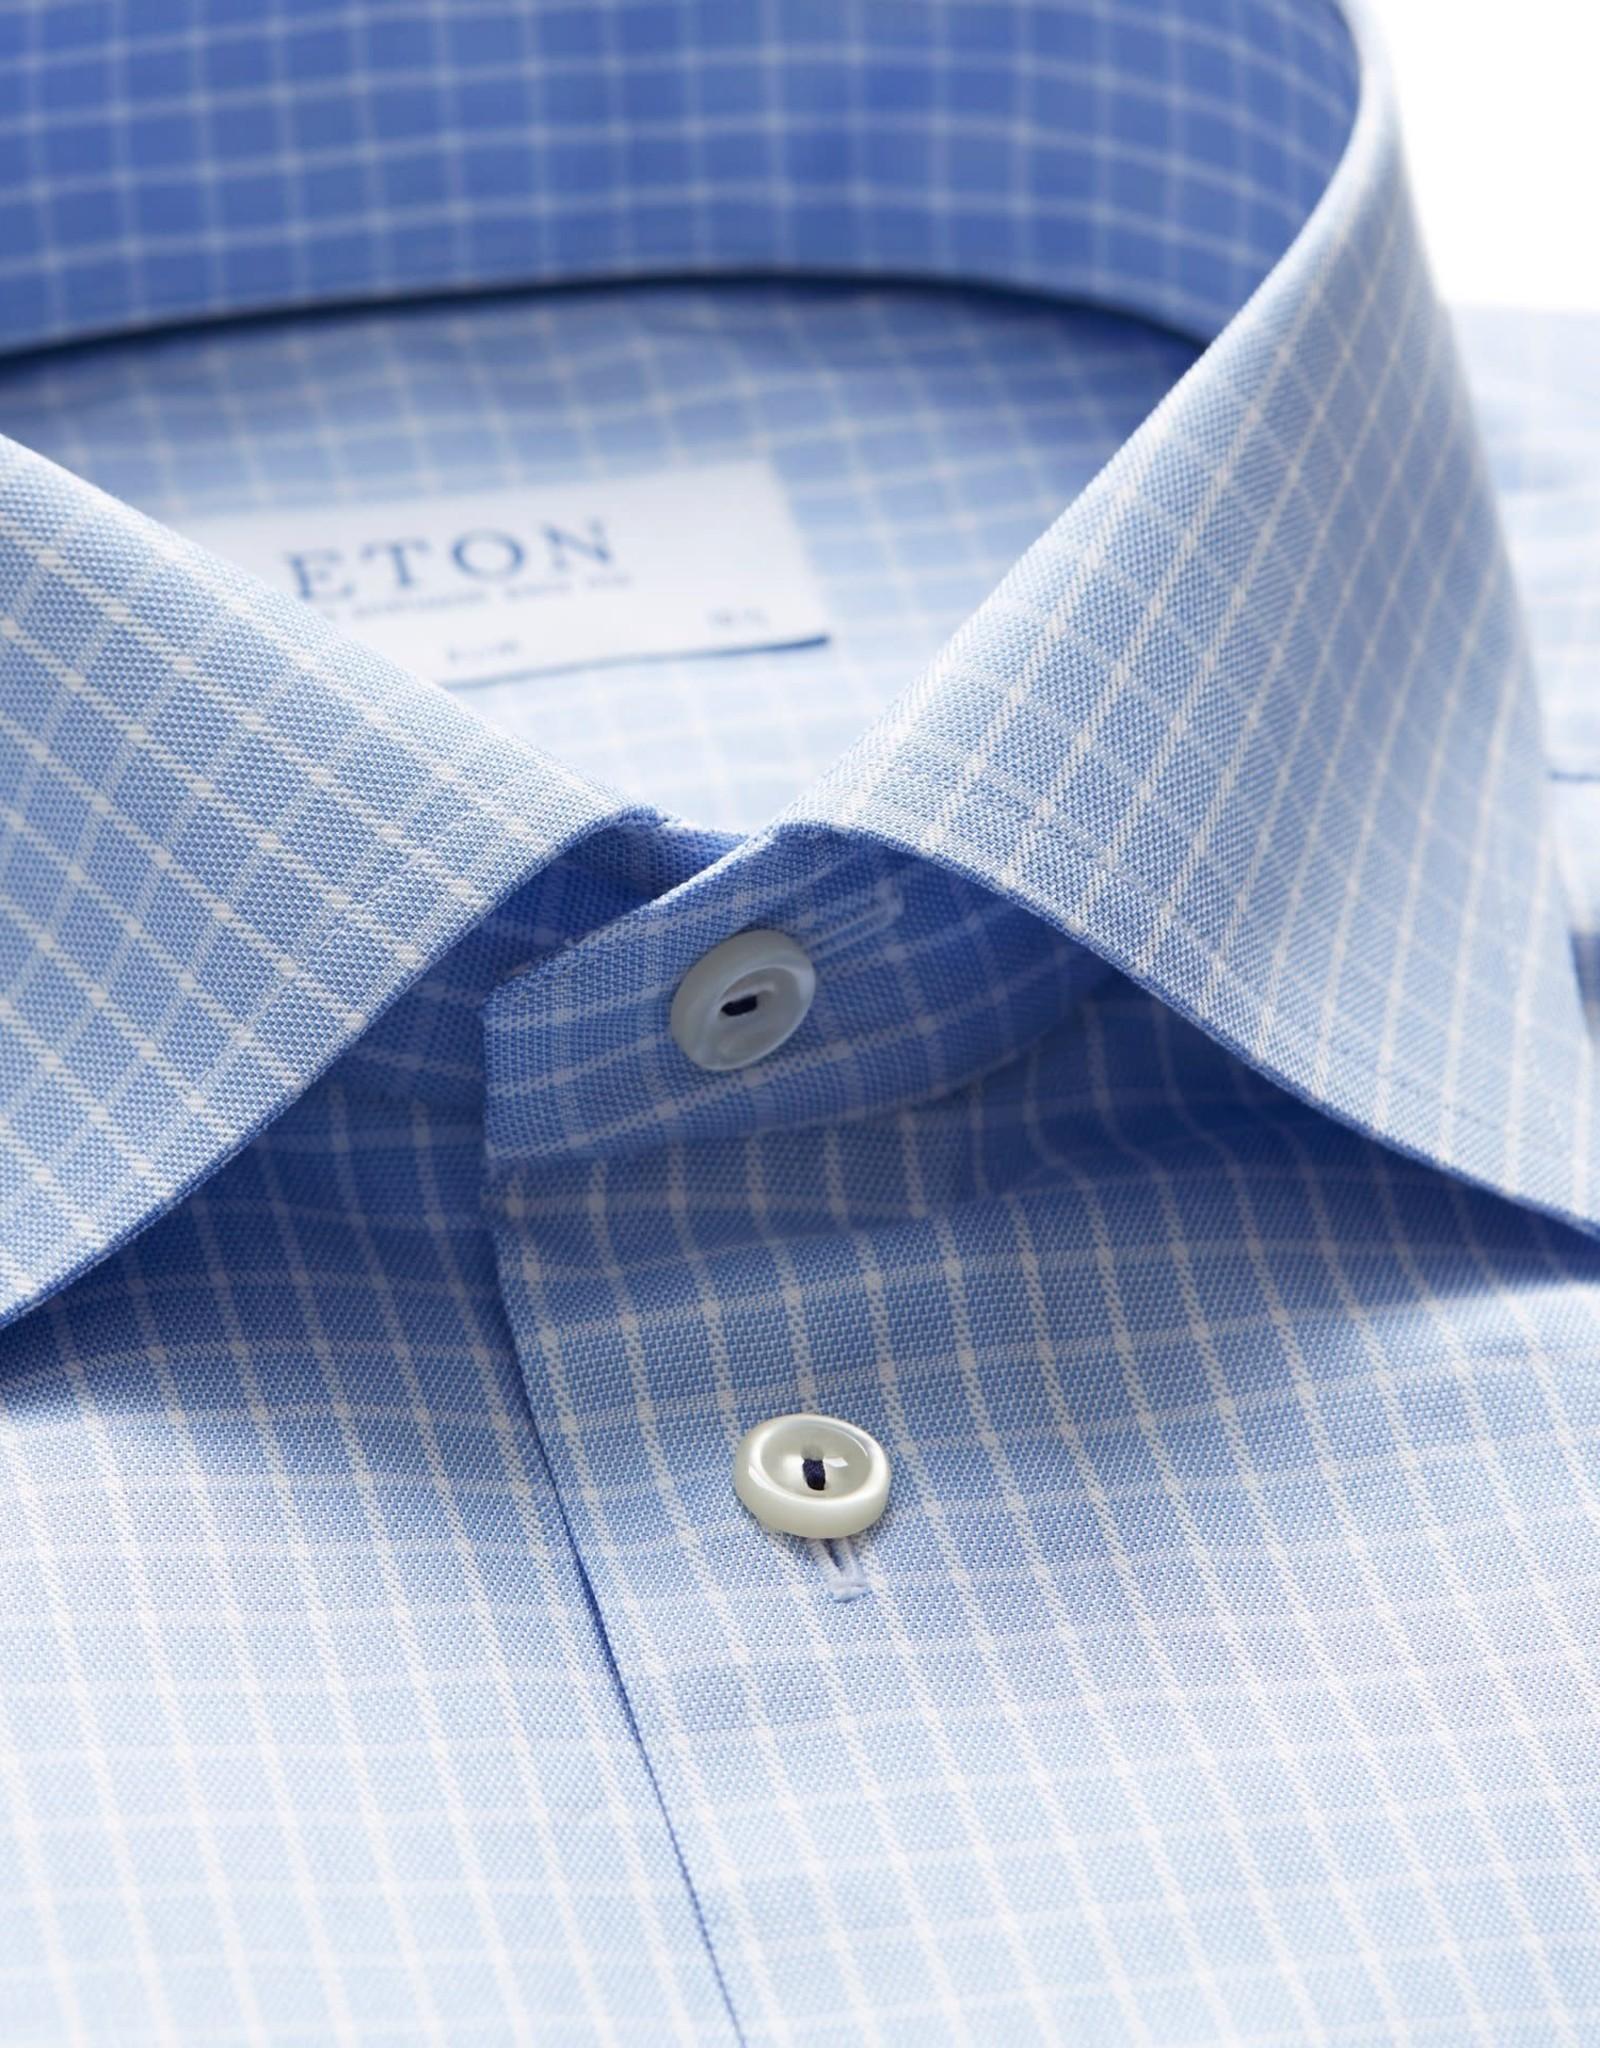 Eton Eton hemd blauw slim 3398-79607/21